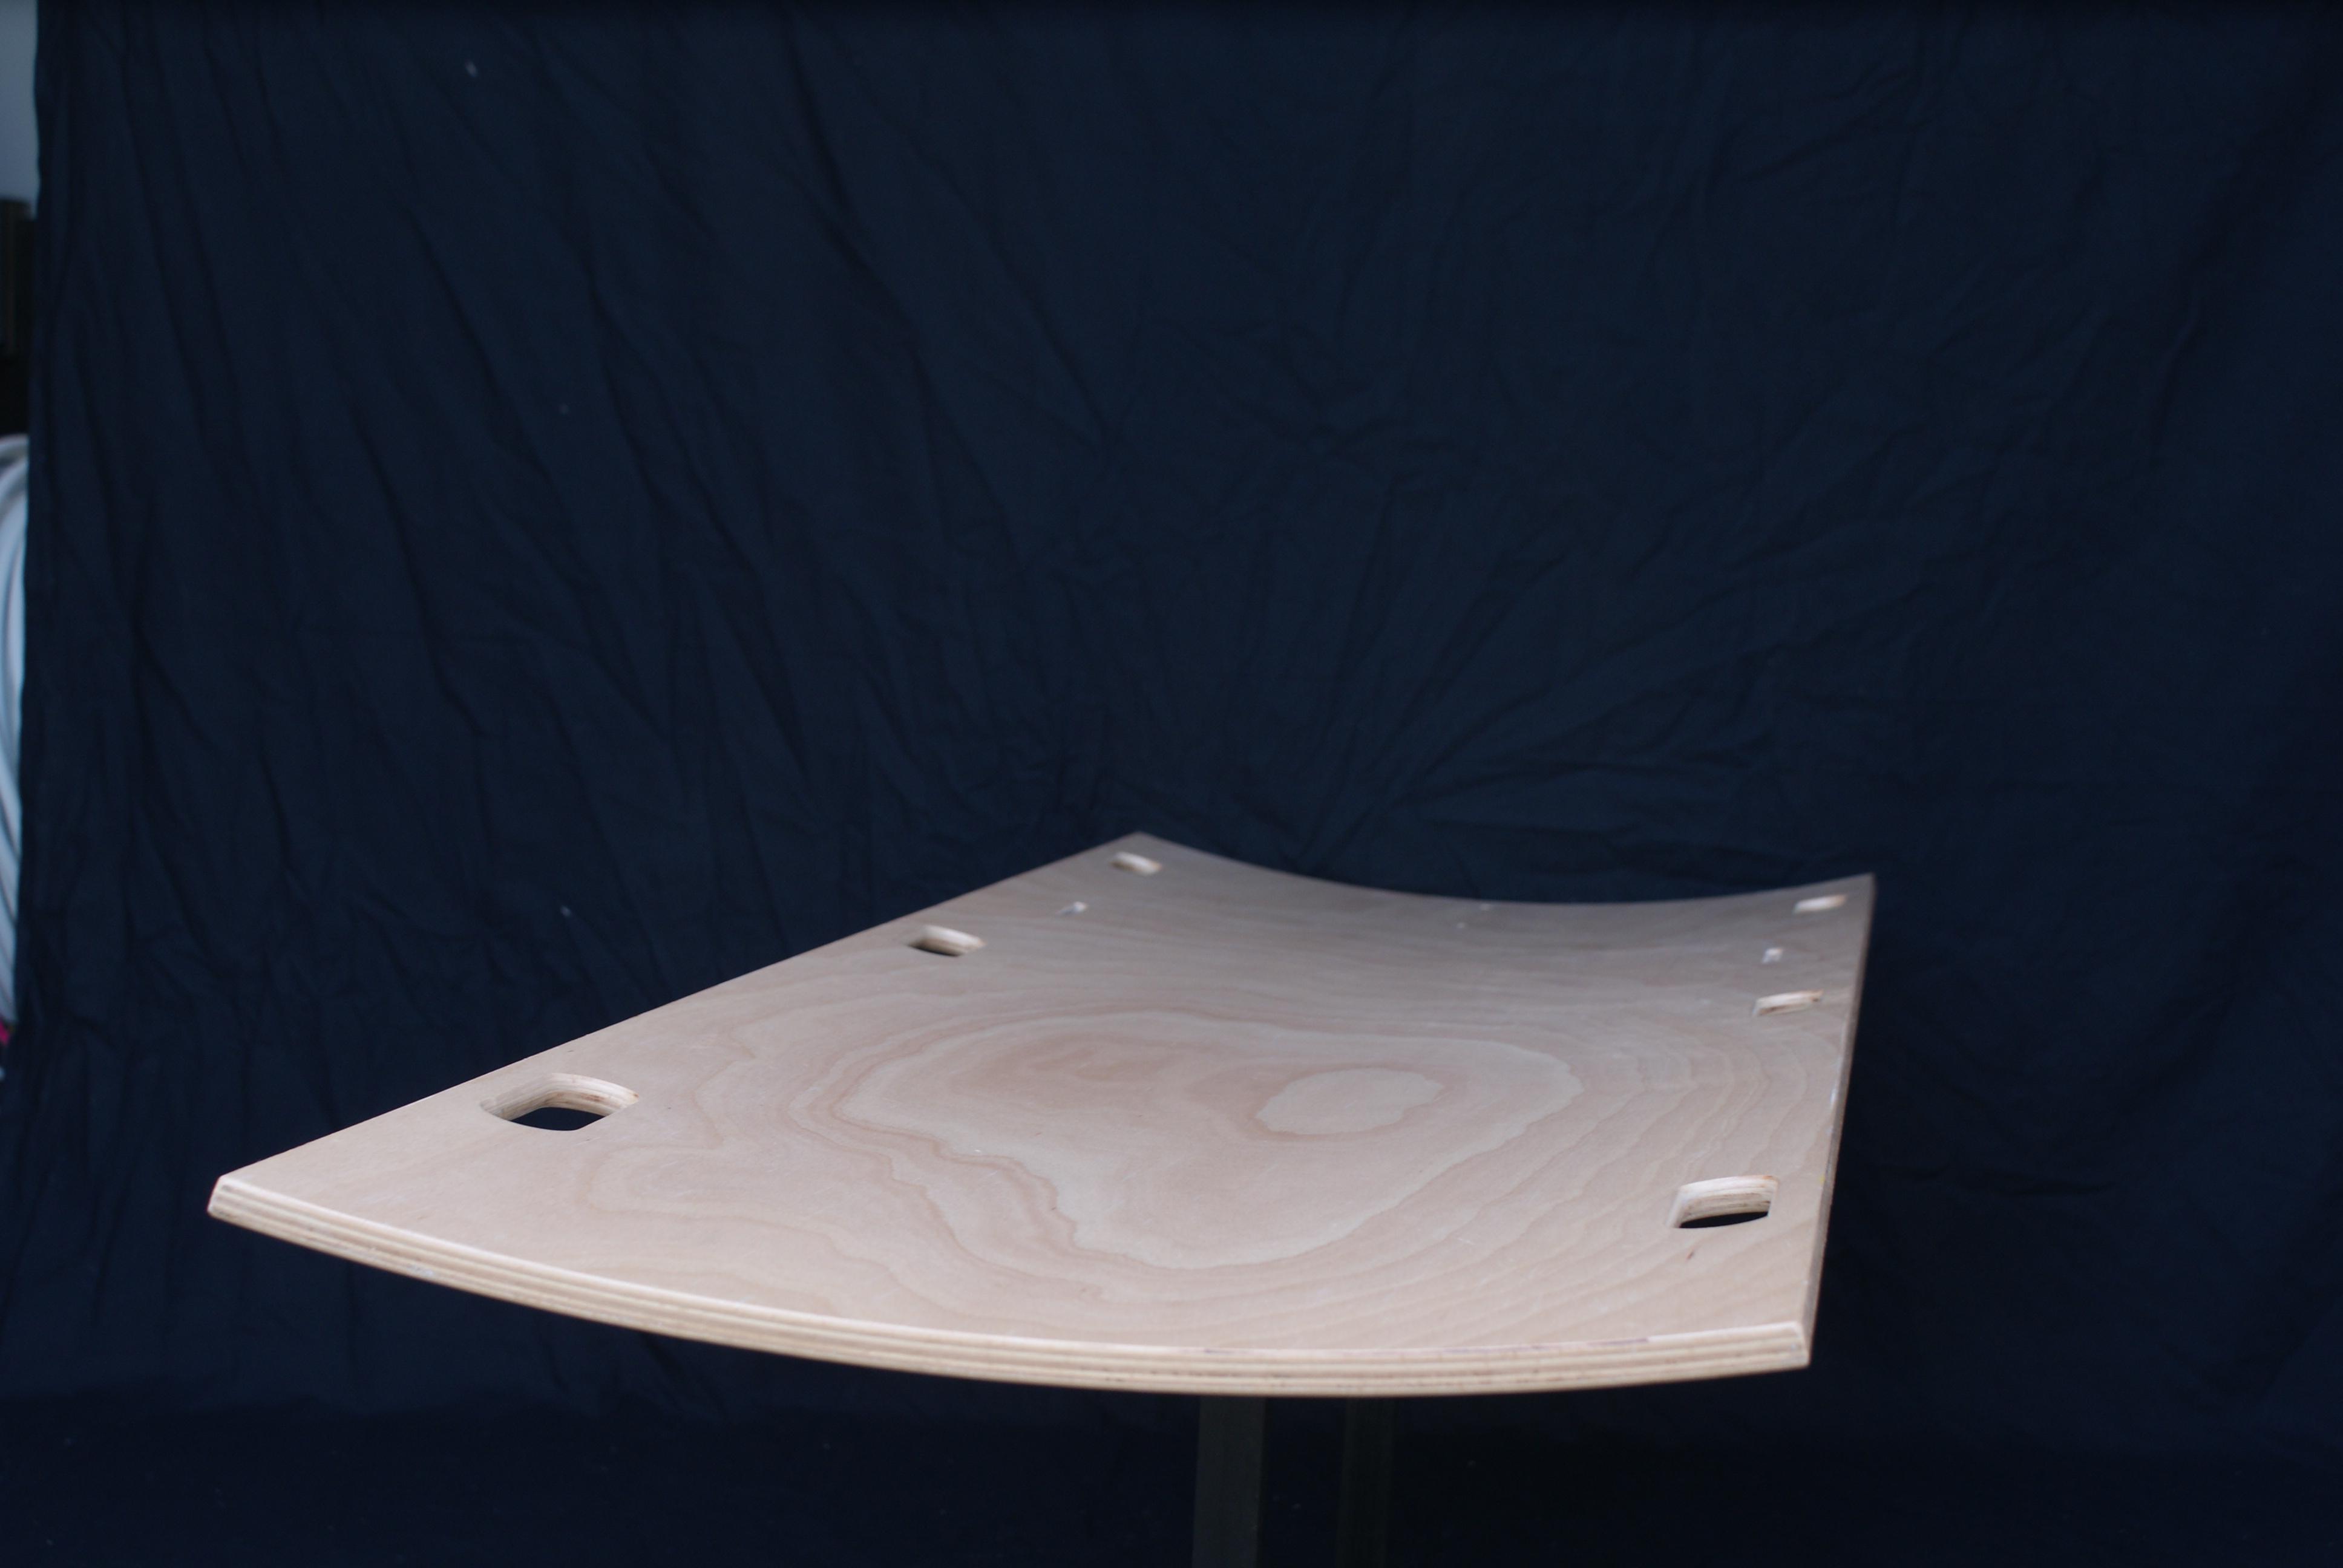 Baar aardeplank - LUX atelier